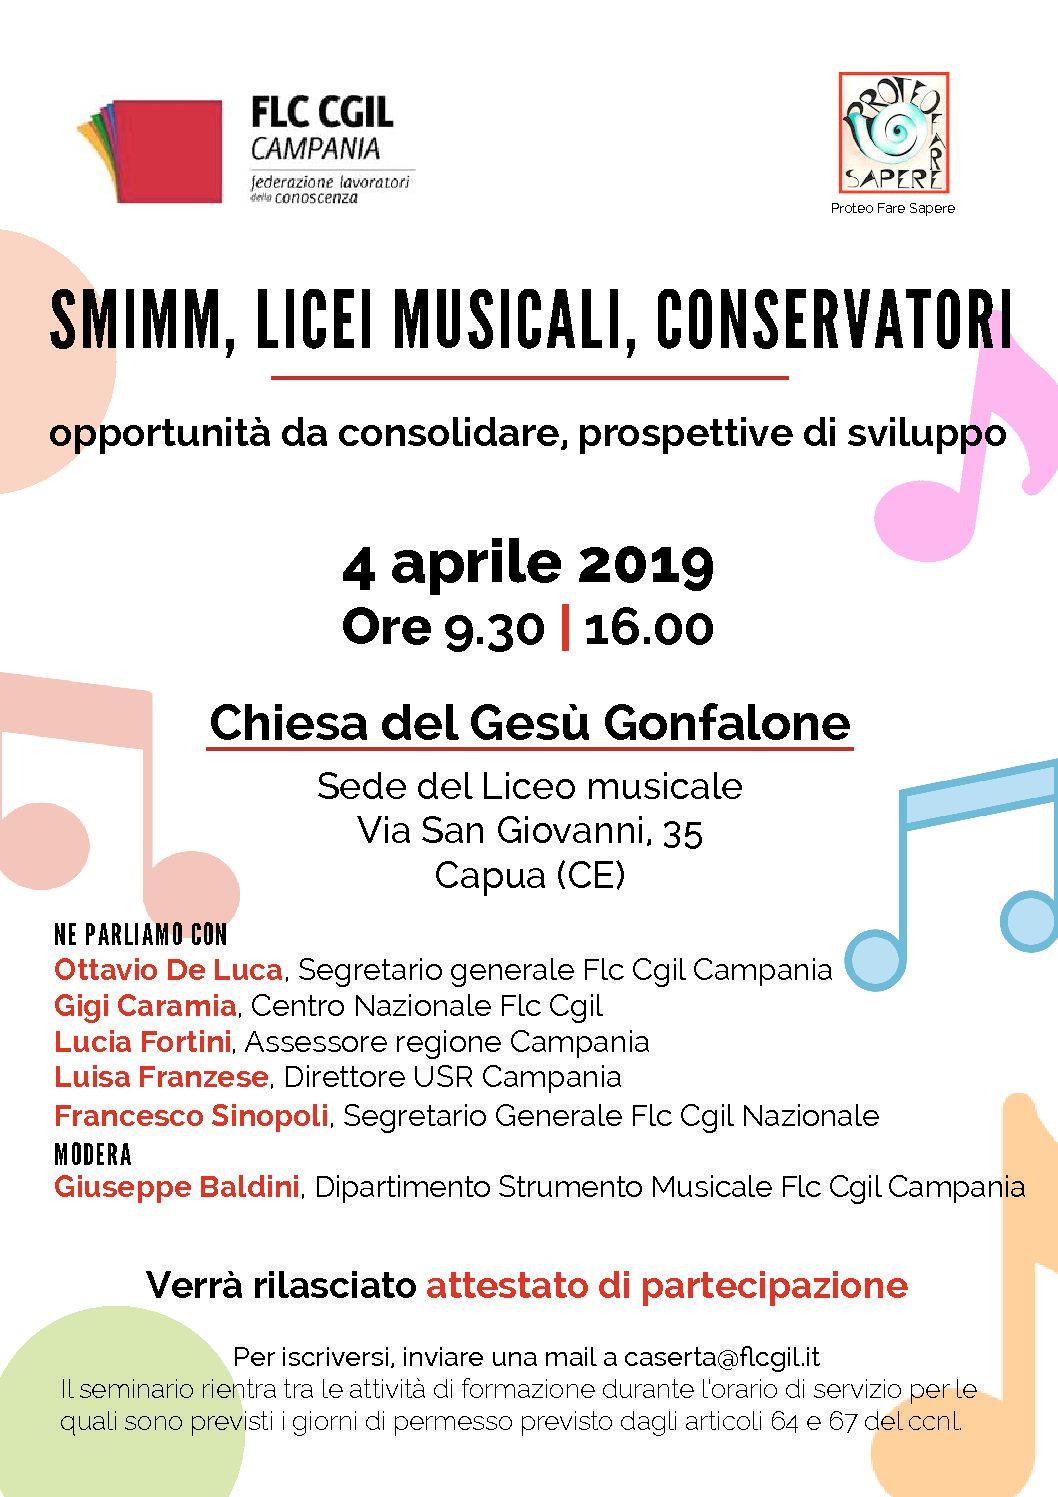 SMIMM, Licei musicali, Conservatori | Convegno a Capua, 4 aprile 2019